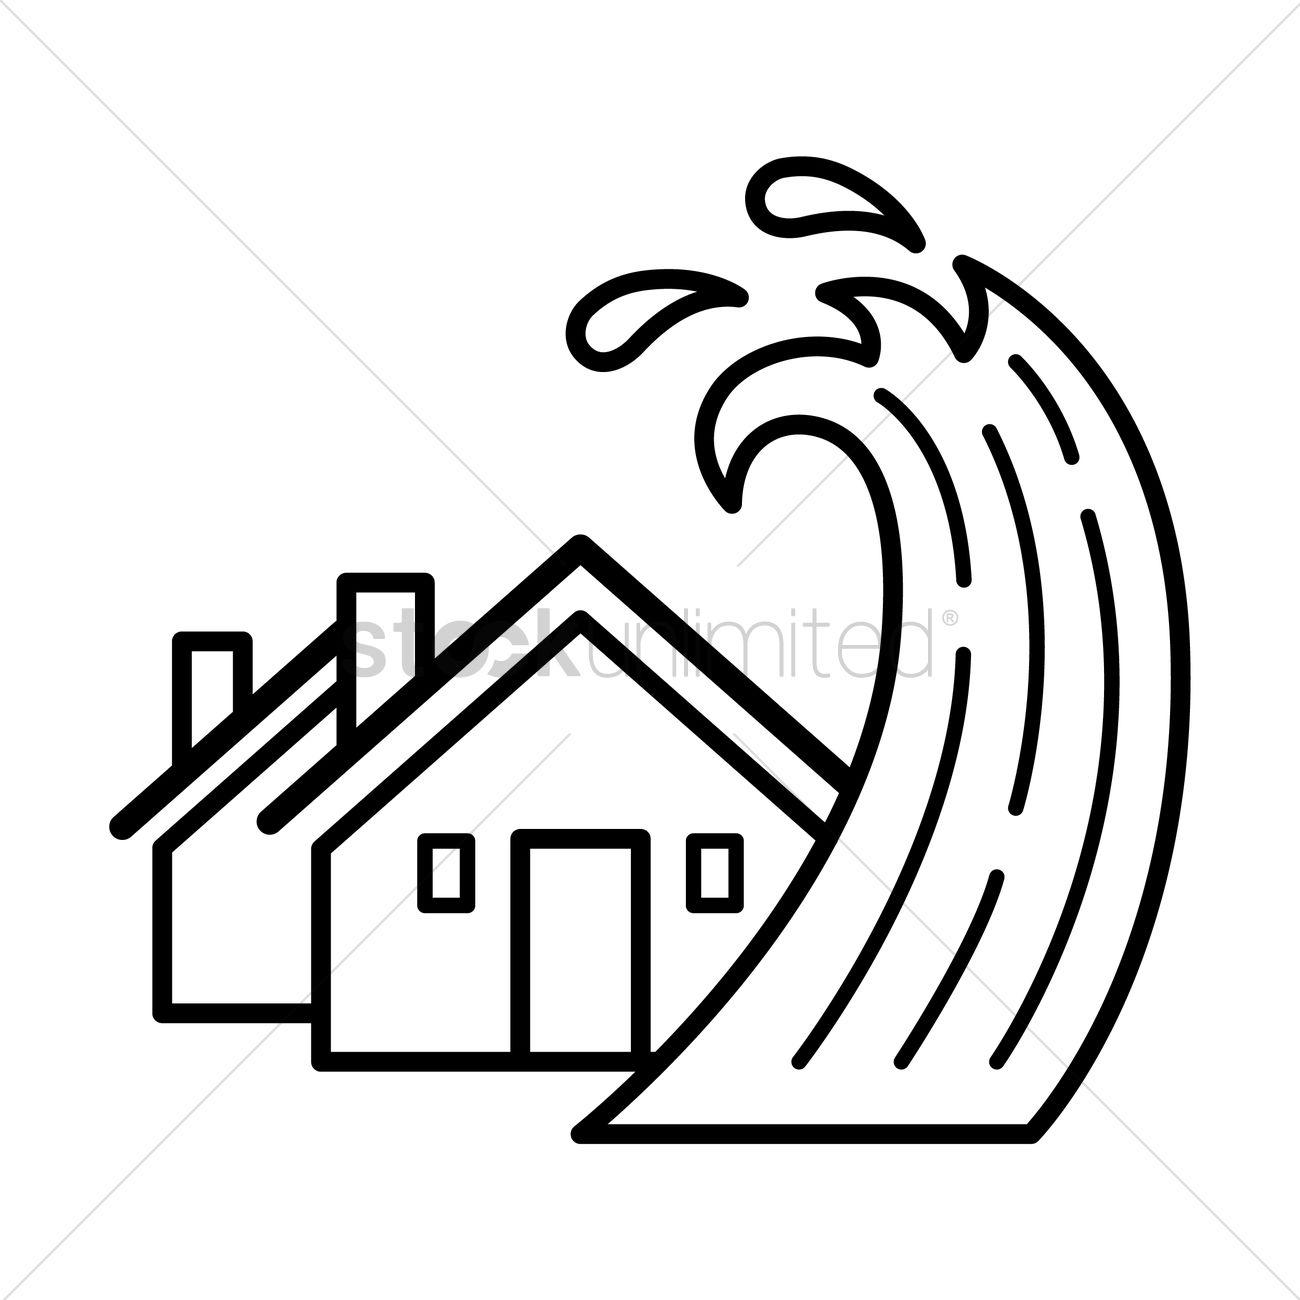 House With Tsunami Concept Vector Image